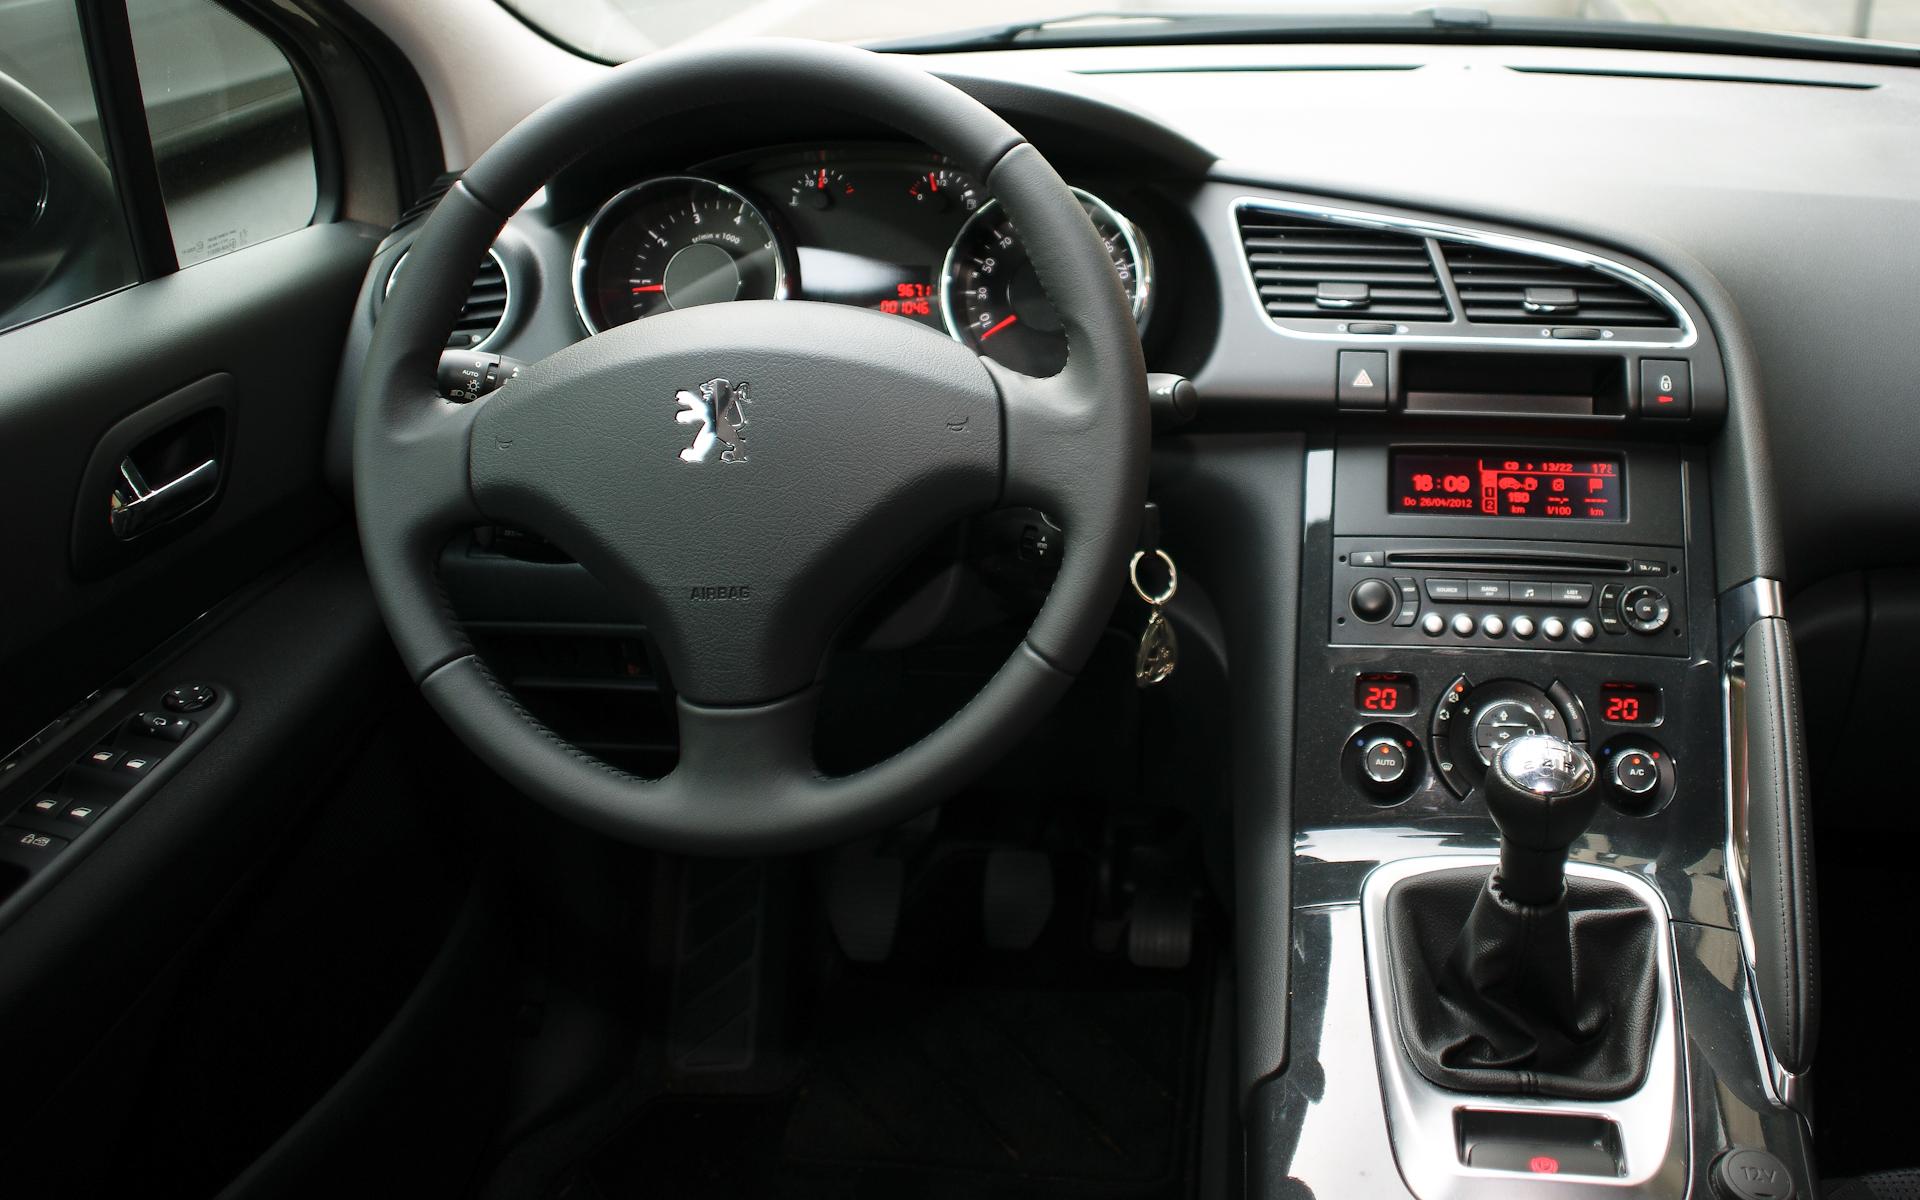 File:Peugeot-3008-cockpit-CherryX.jpg - Wikimedia Commons